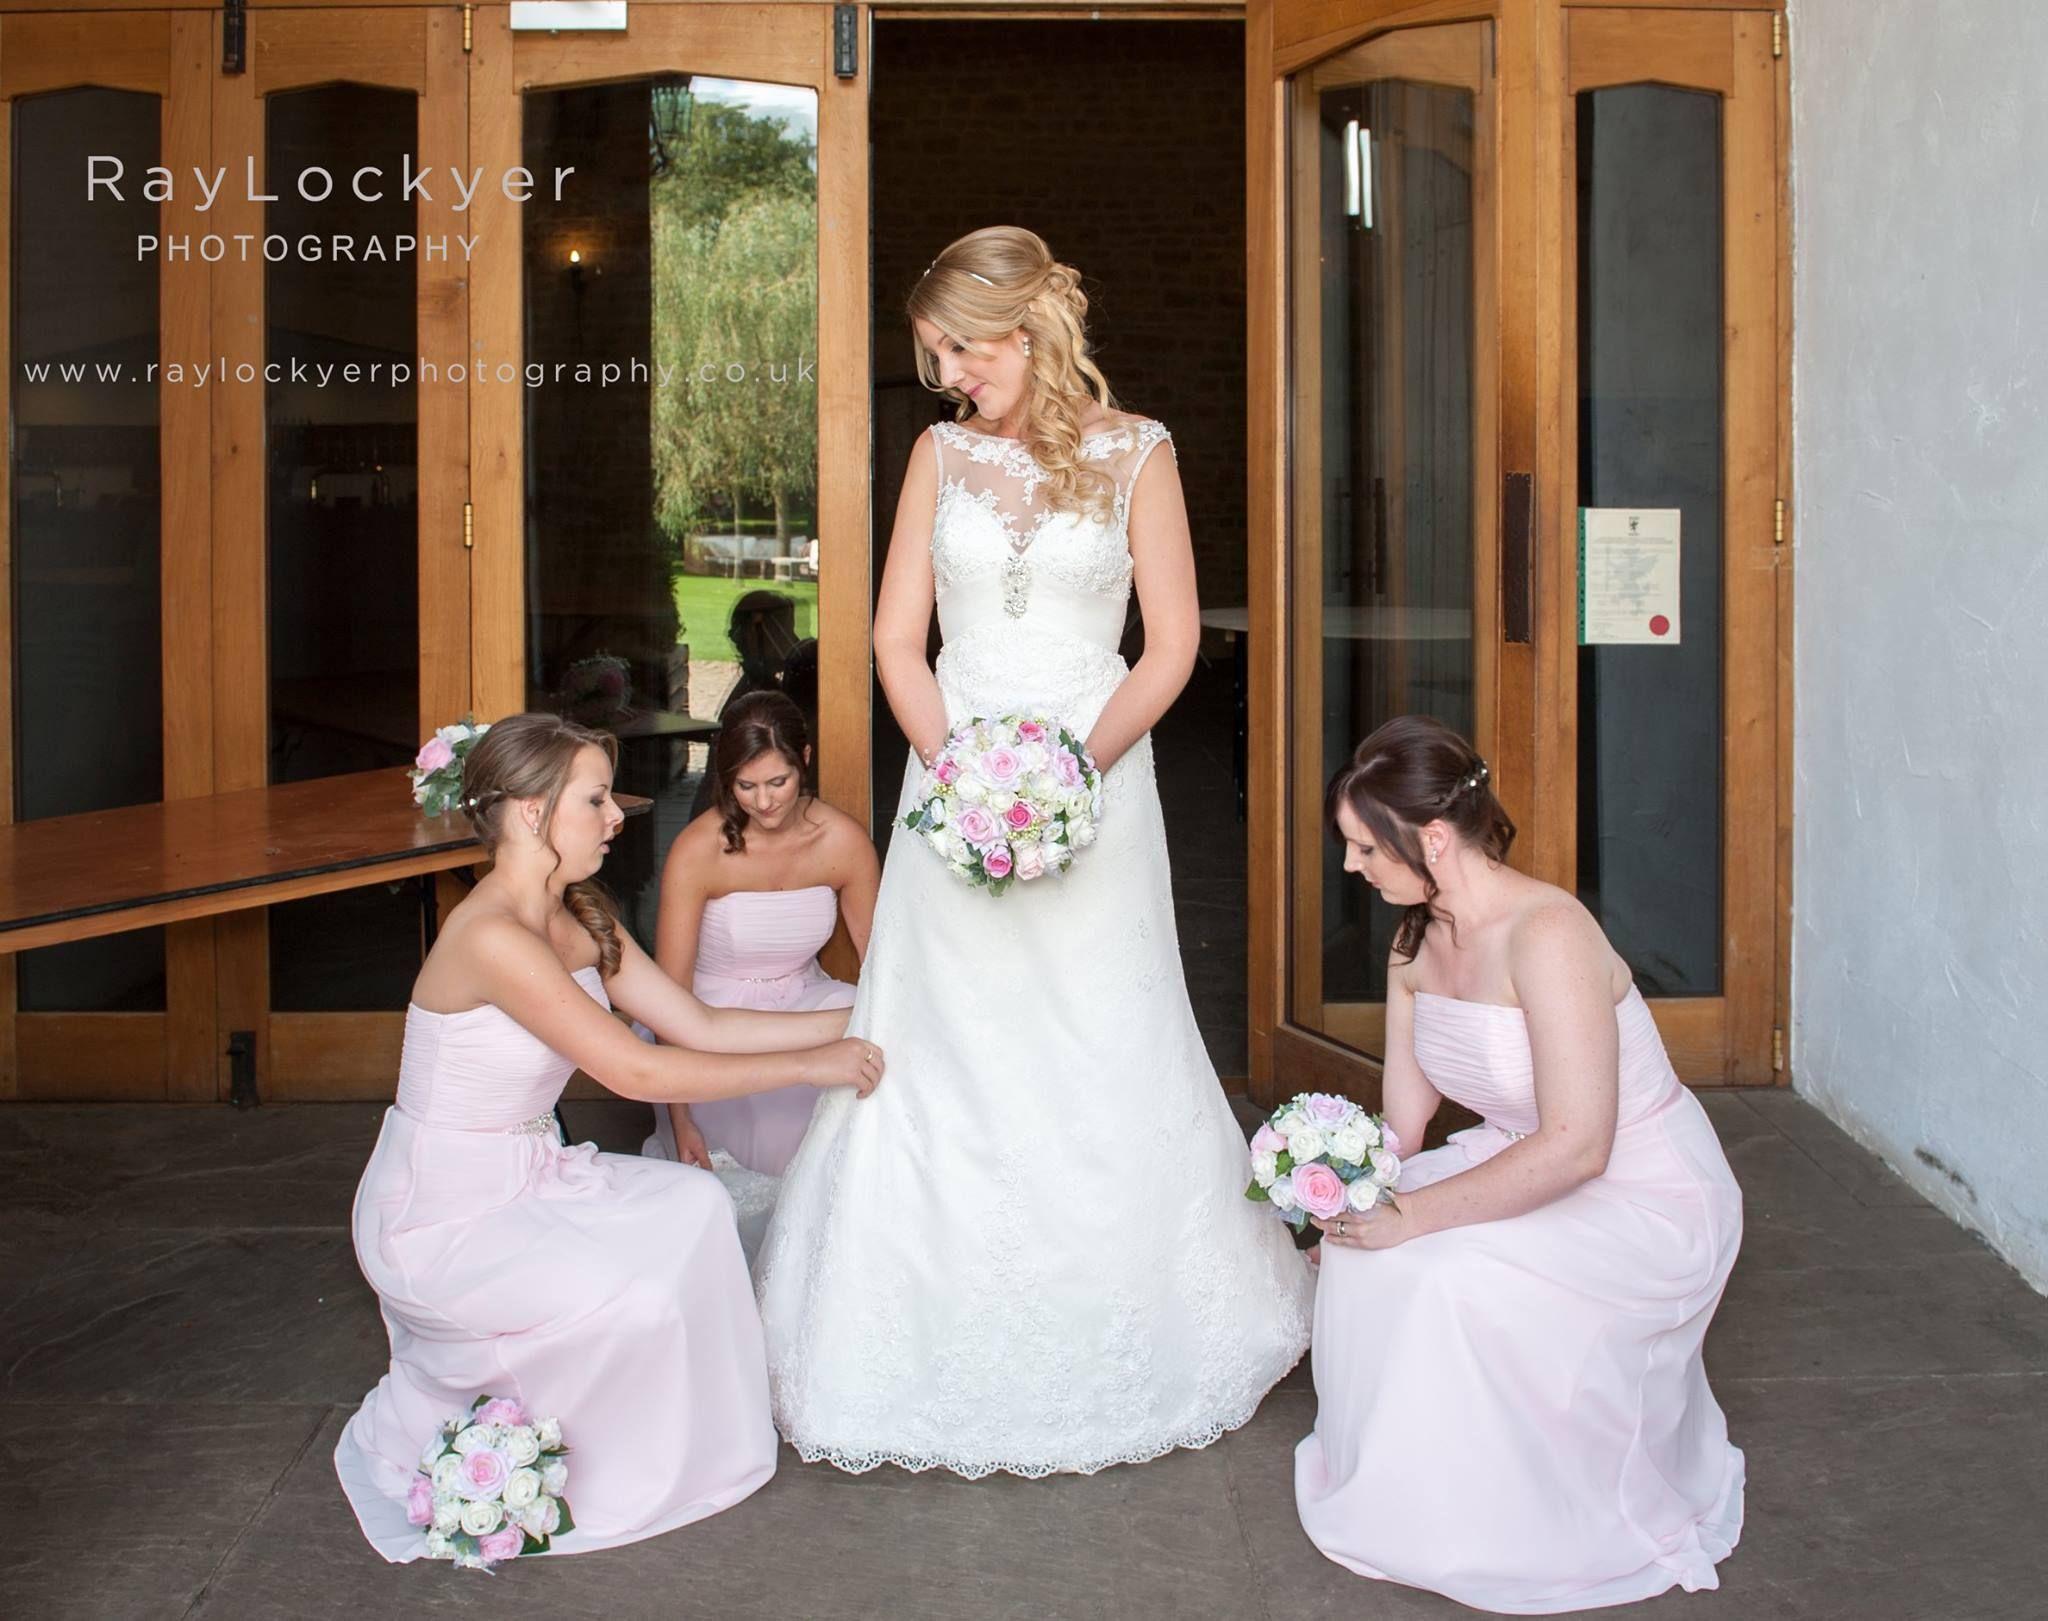 Ray Lockyer Yeovil Wedding Photographer - Final prep for our bride ...